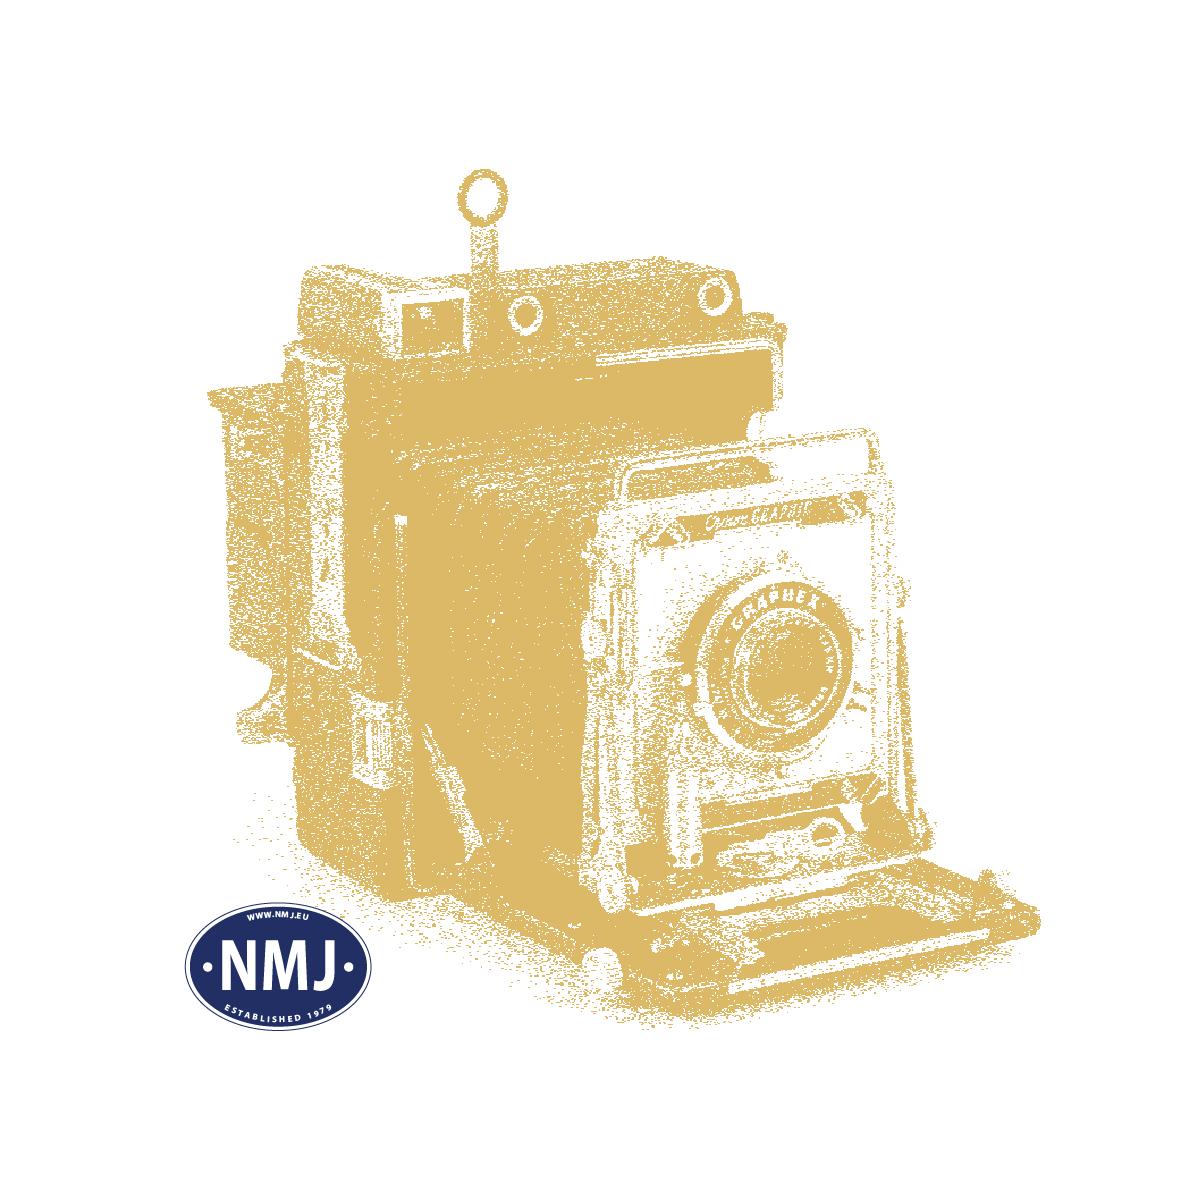 NMJT86.200AC - NMJ Topline NSB El11.2093, Gammeldeisgn, AC Digital